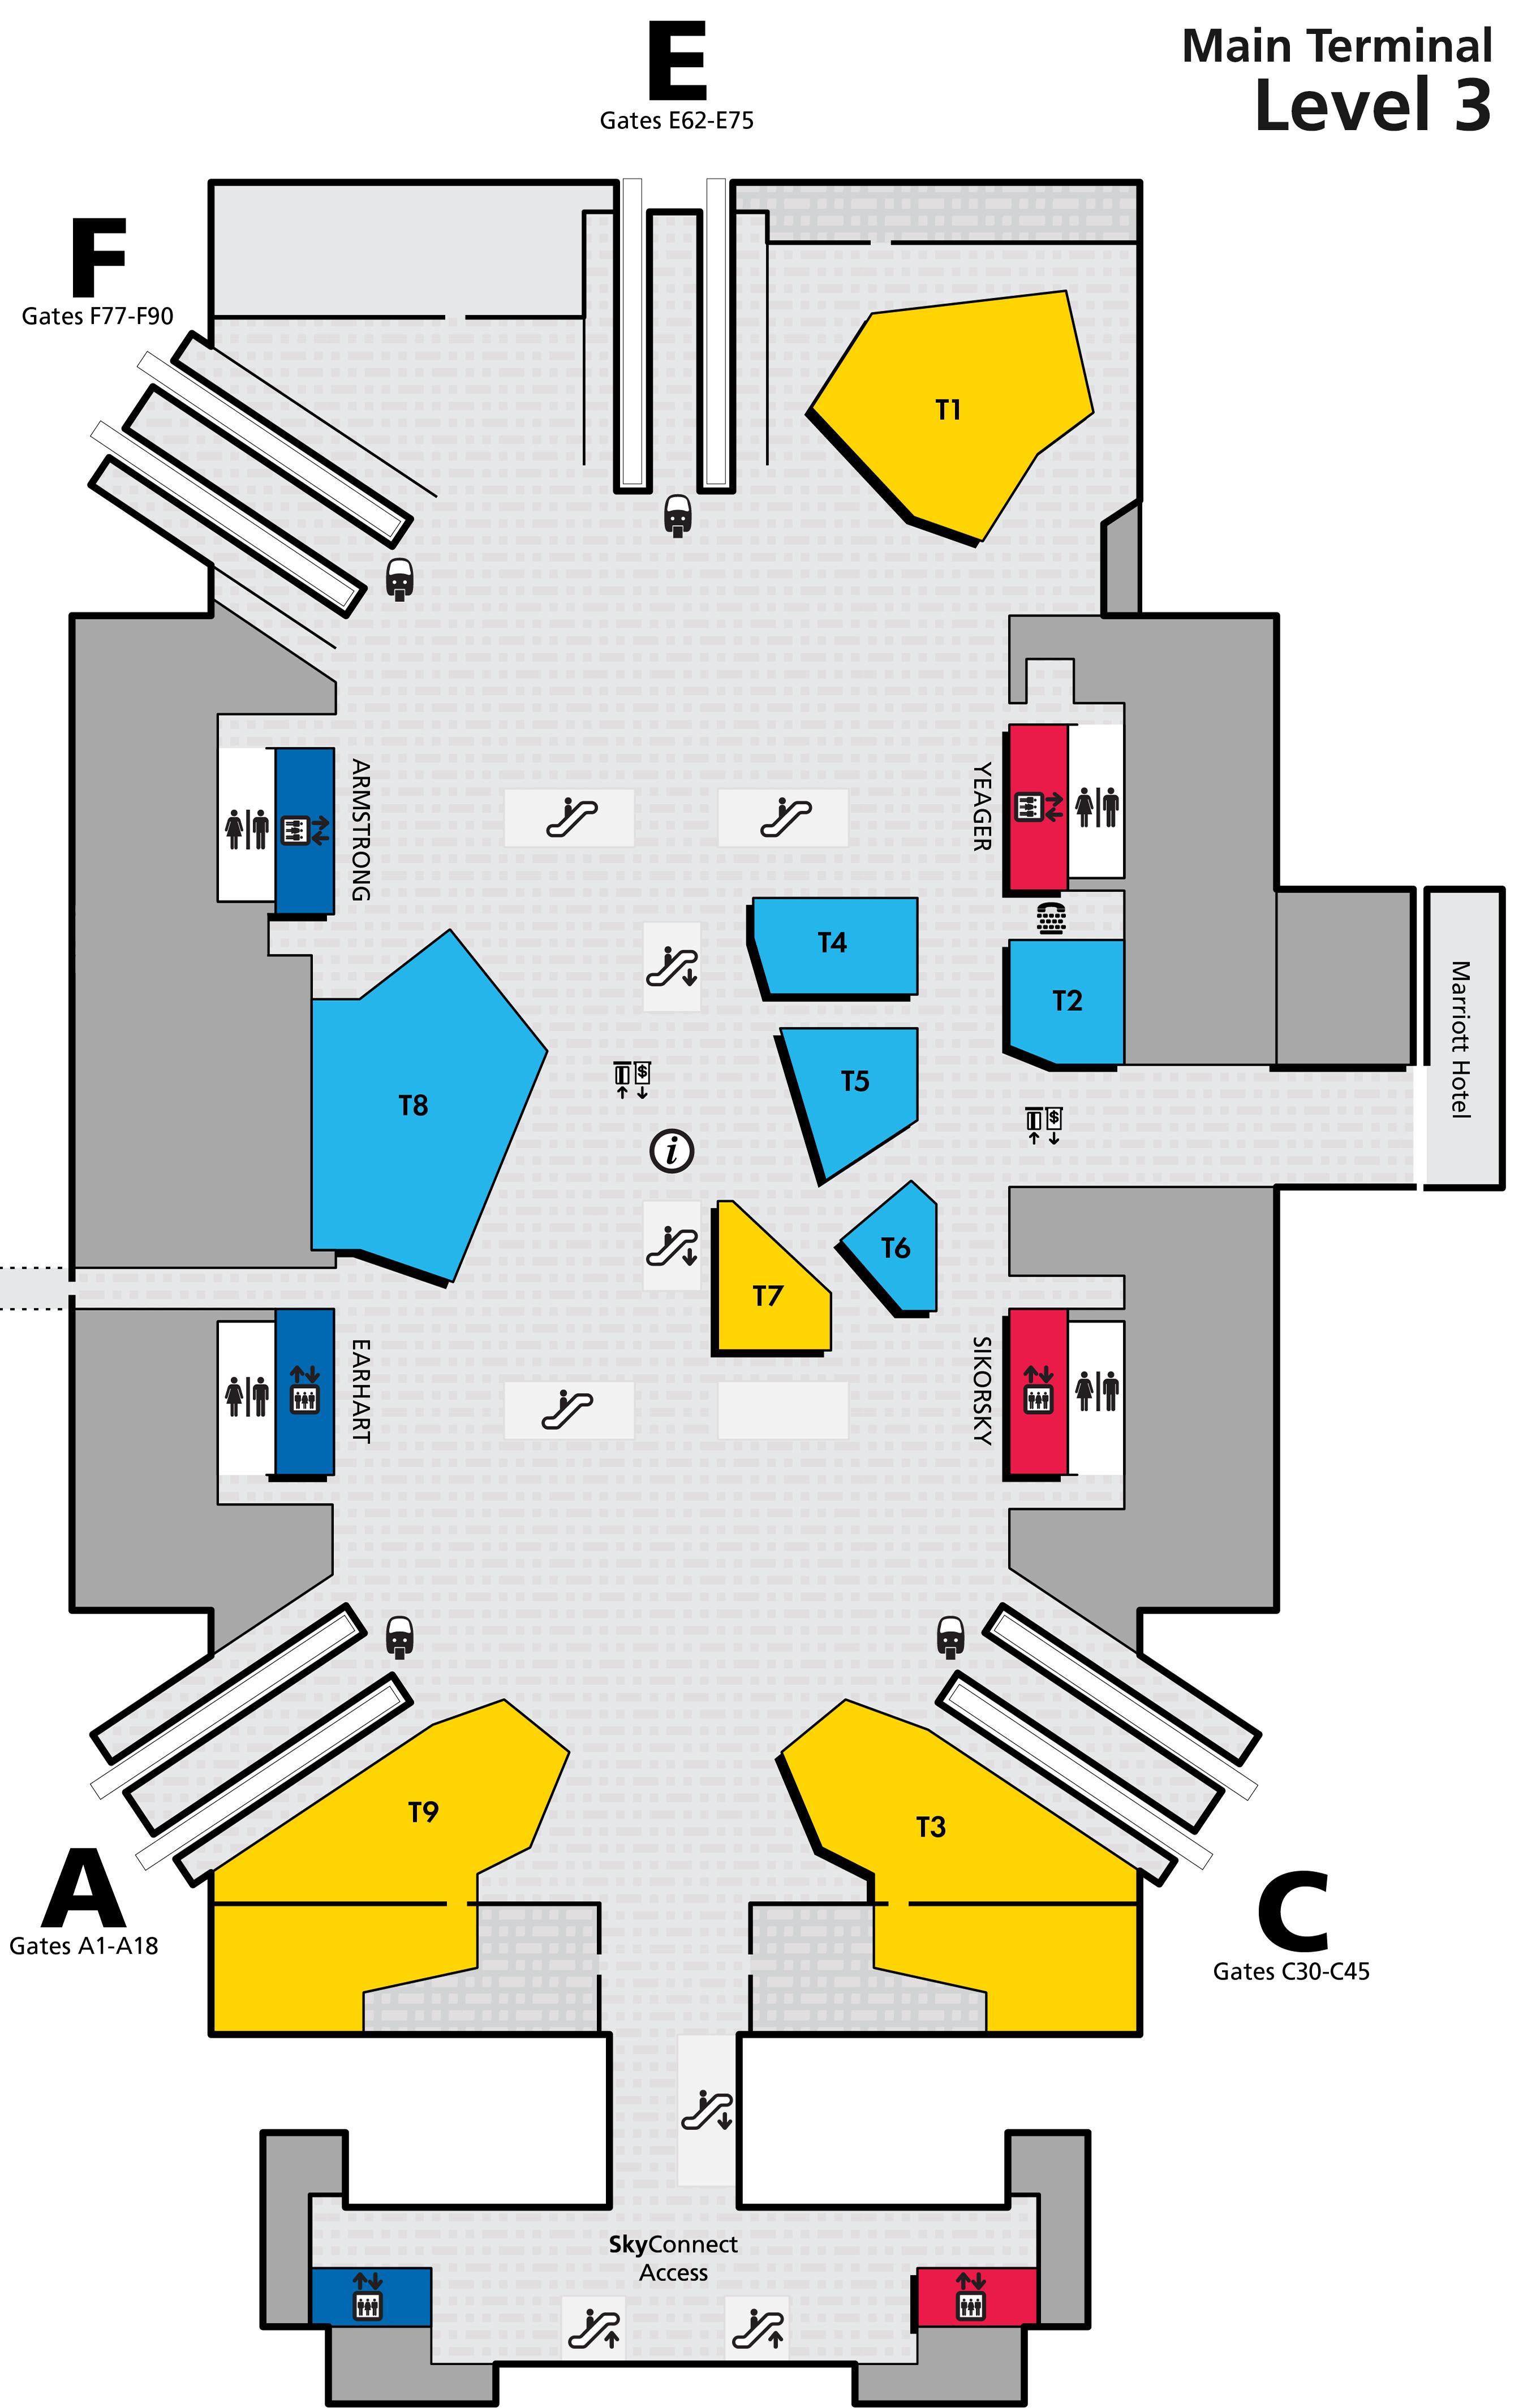 Main Terminal Map - Level 3